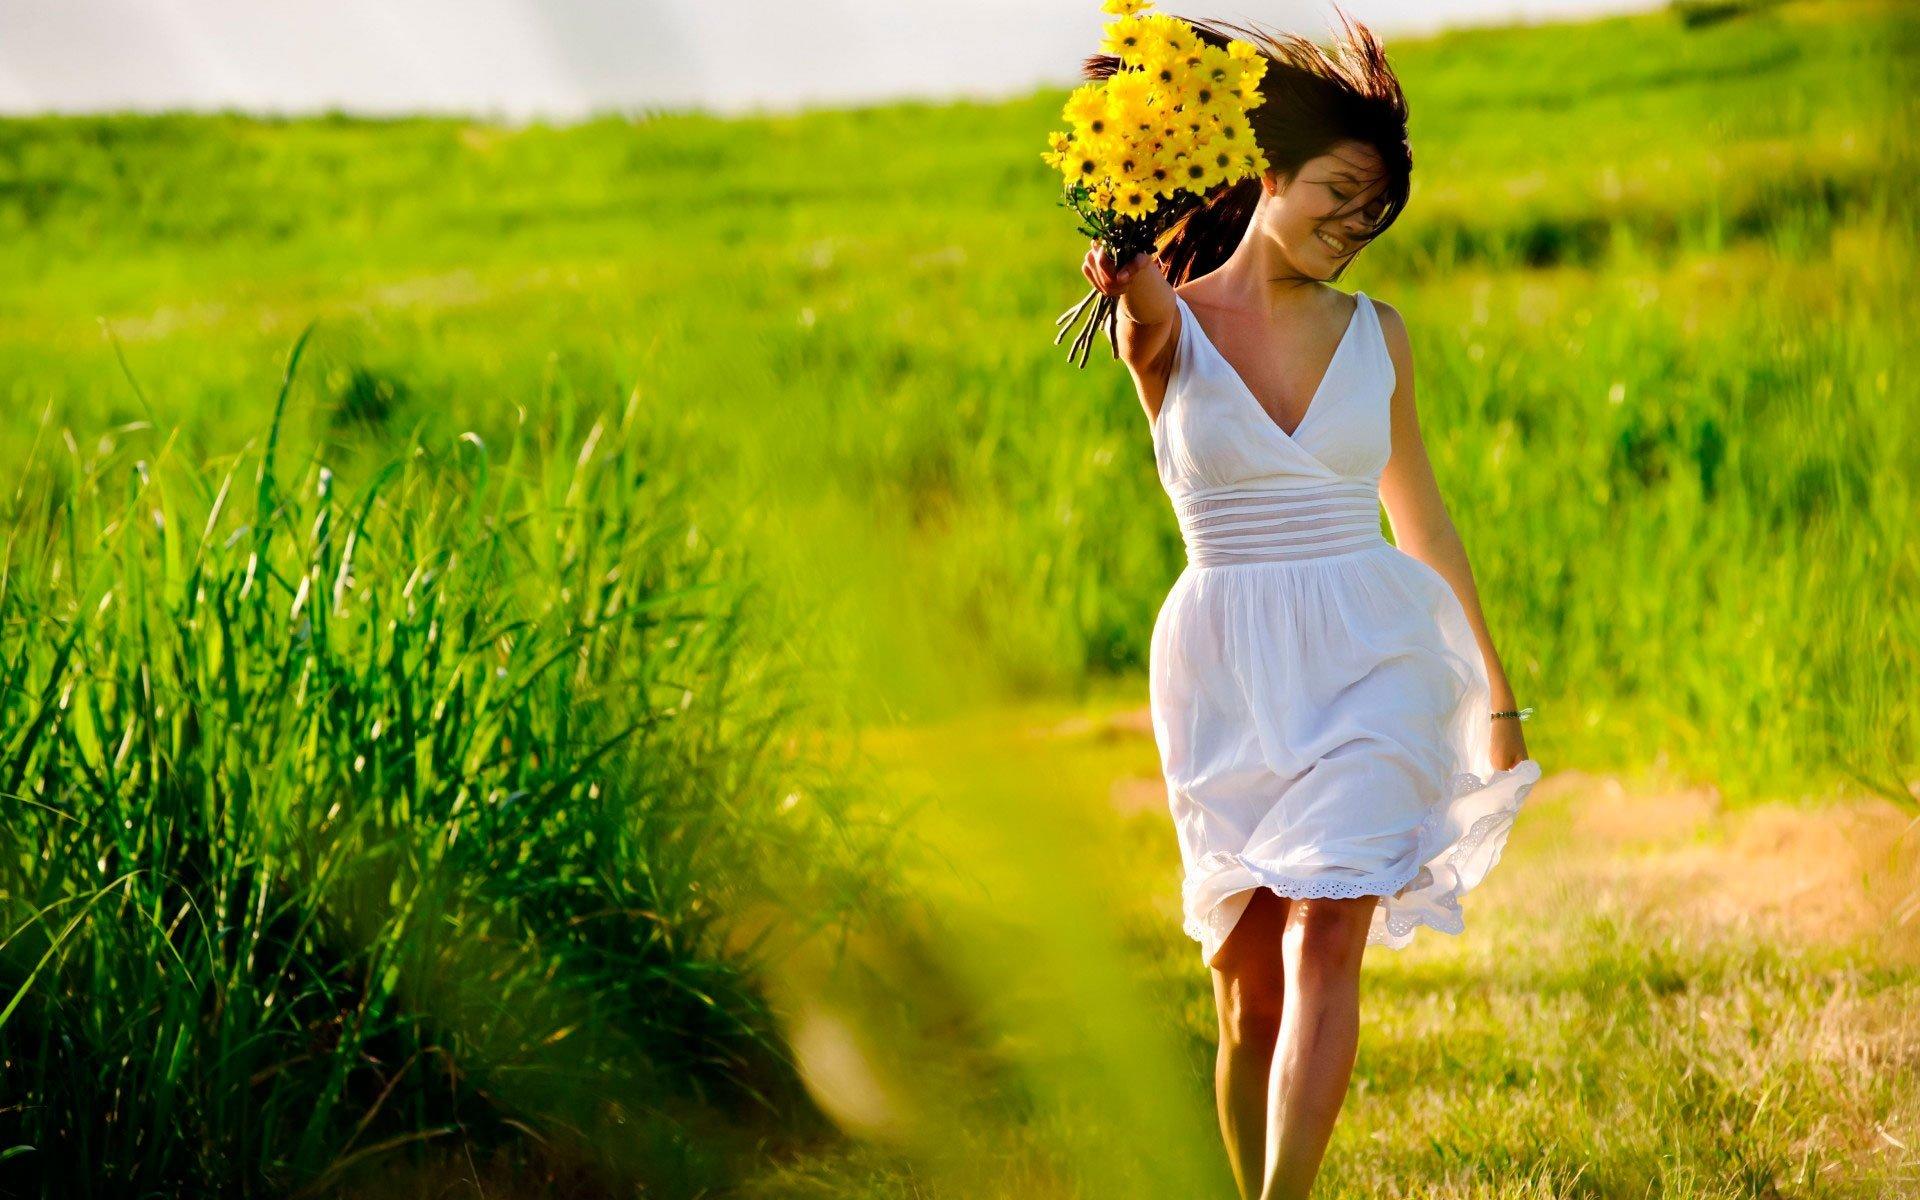 V E N E R A (морок красоты и очарования) - Страница 2 76982074